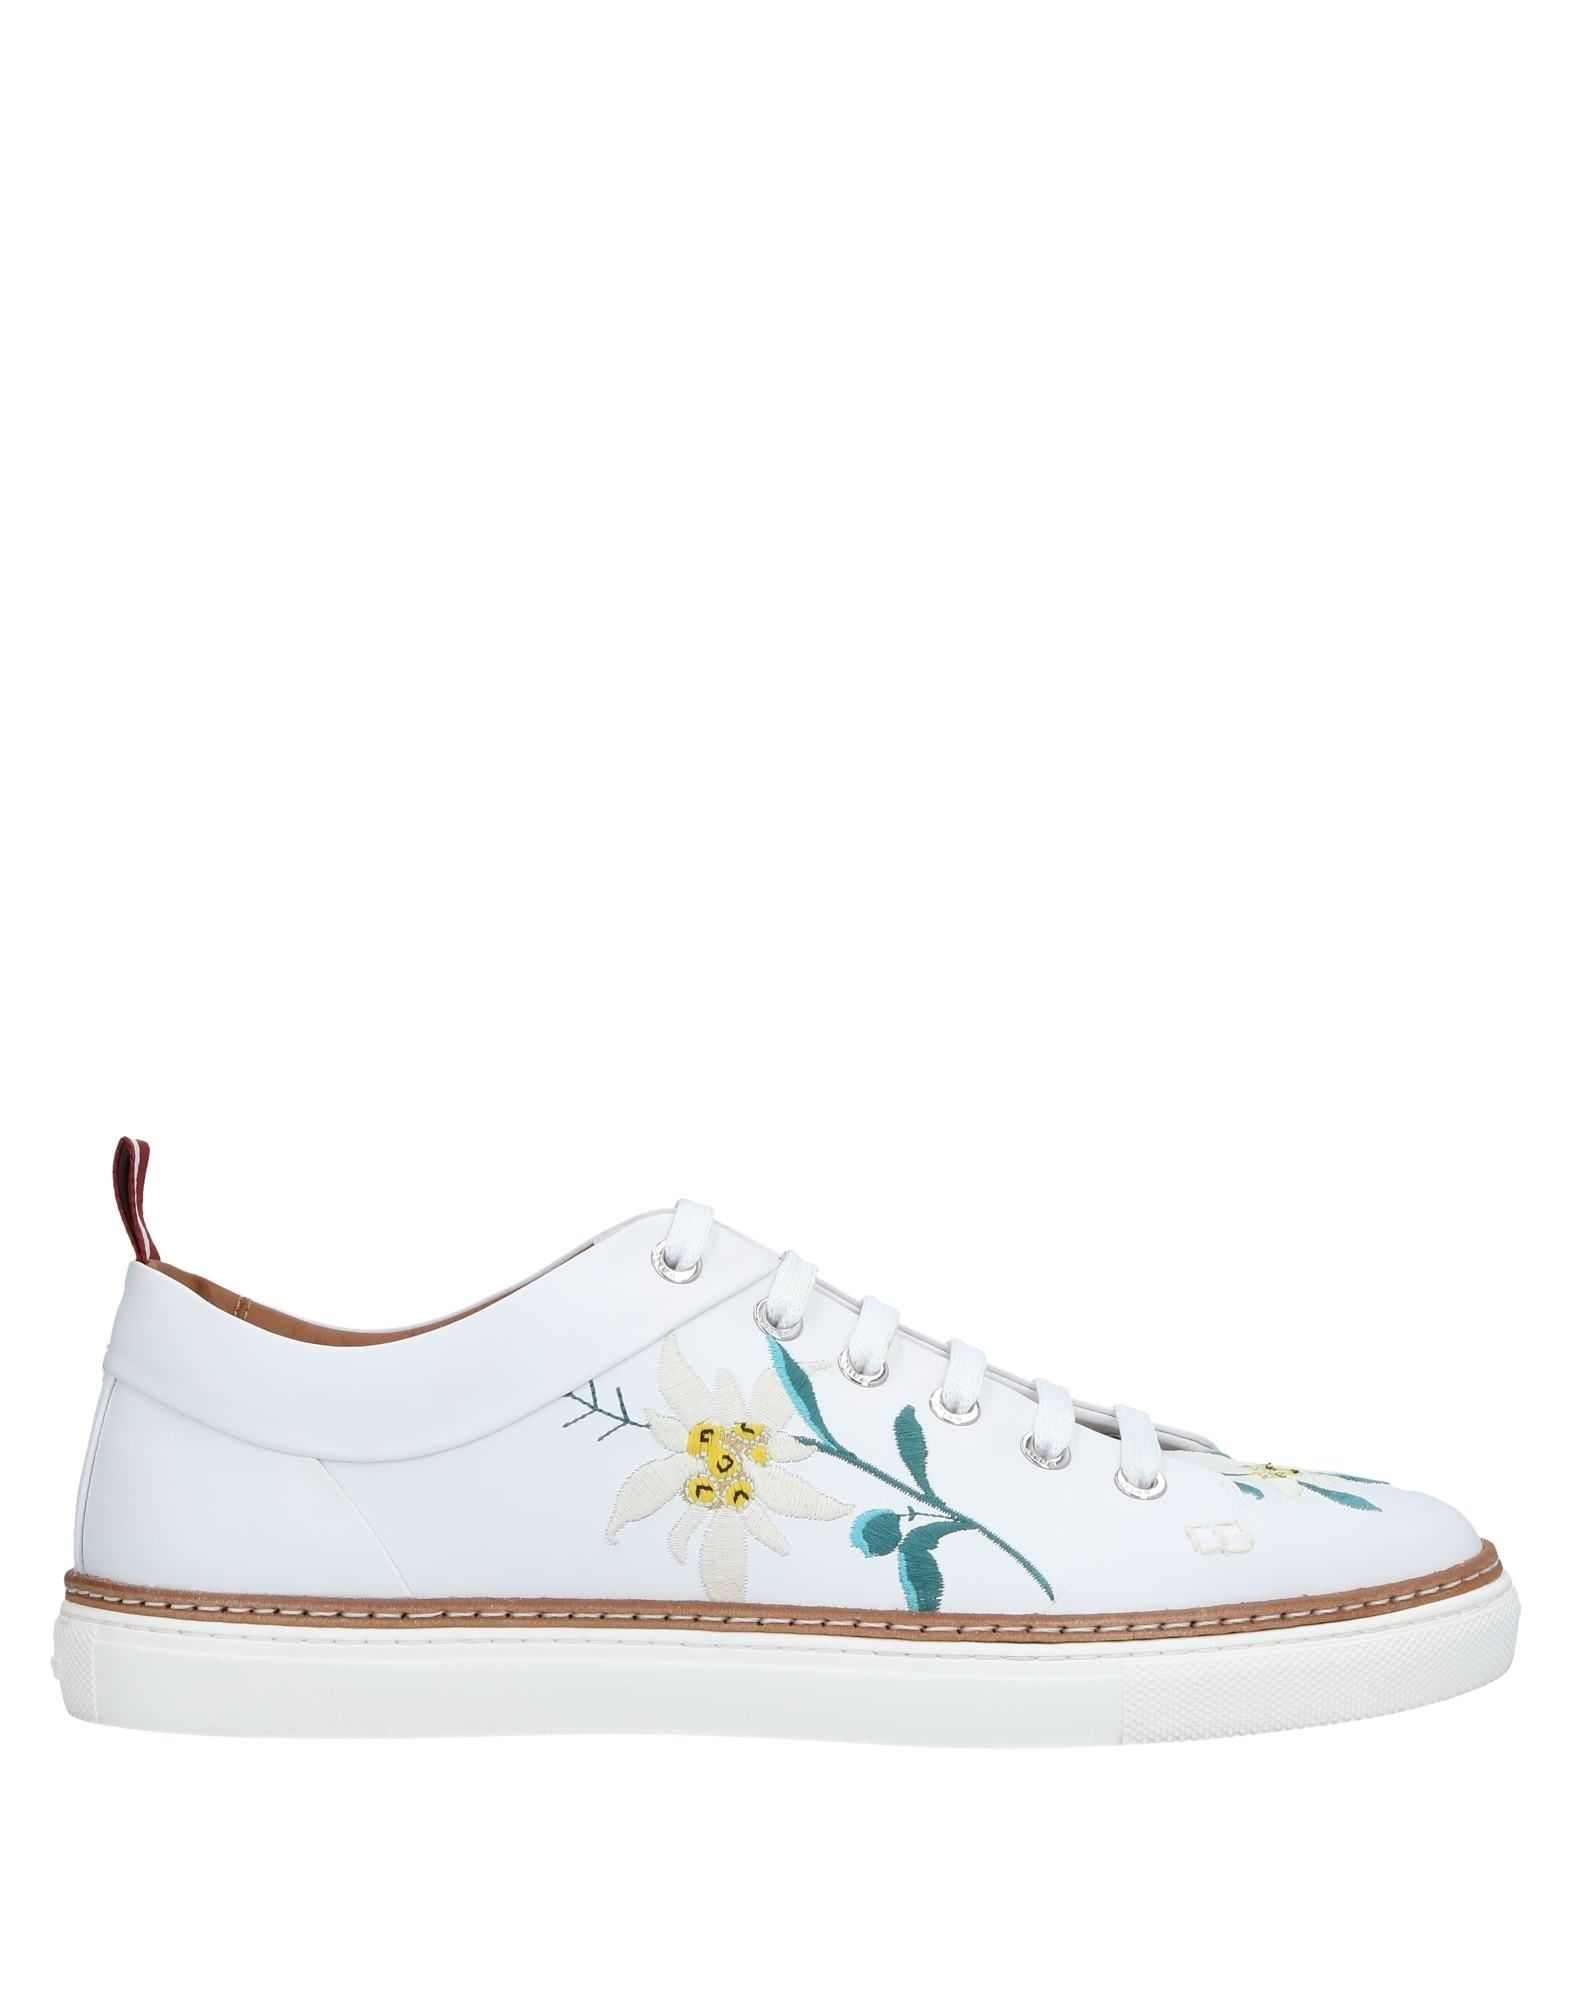 3d03be73a78 BALLY ΠΑΠΟΥΤΣΙΑ Παπούτσια τένις χαμηλά, Γυναικεία παπούτσια τέννις ...